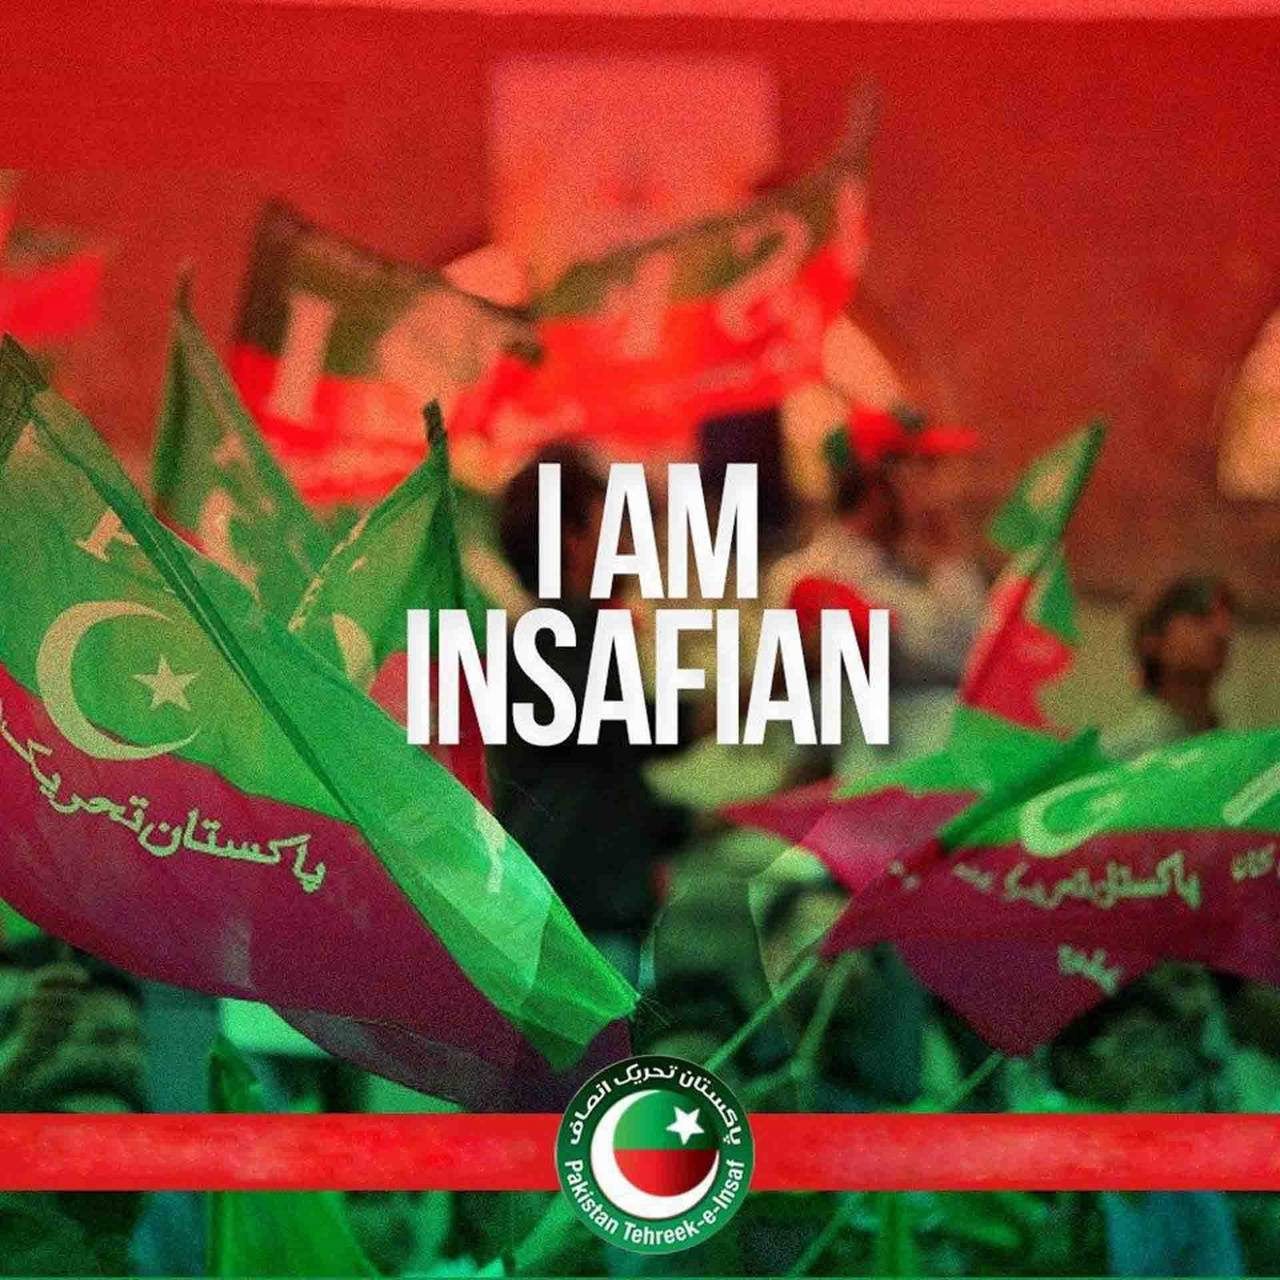 I Am Insafian